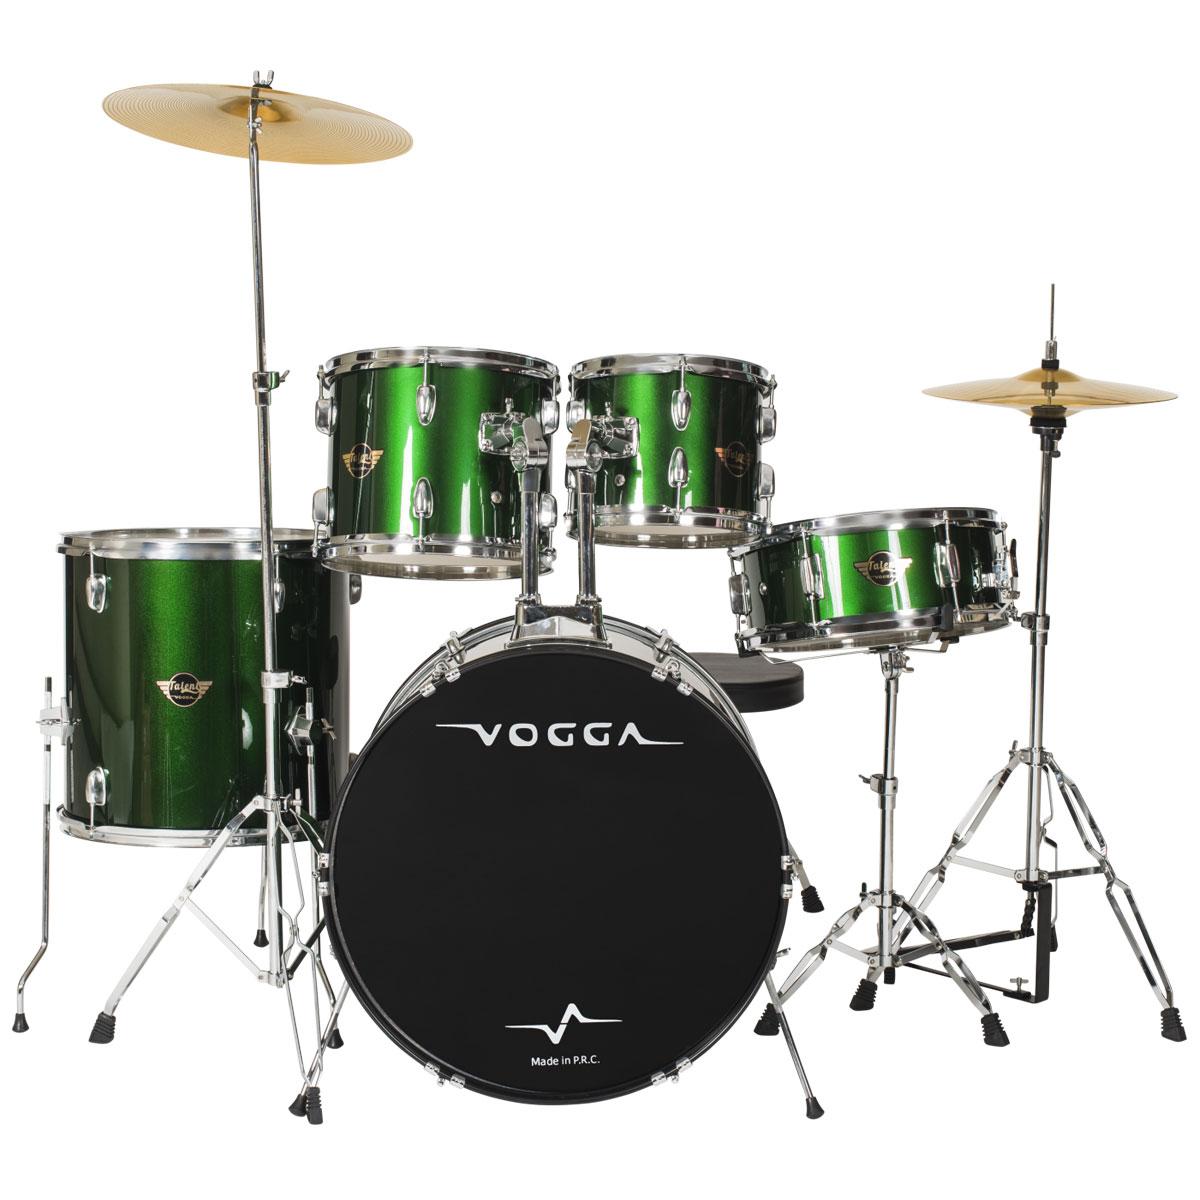 Bateria Ac�stica Bumbo 20 Polegadas Talent VPD920 Verde - Vogga